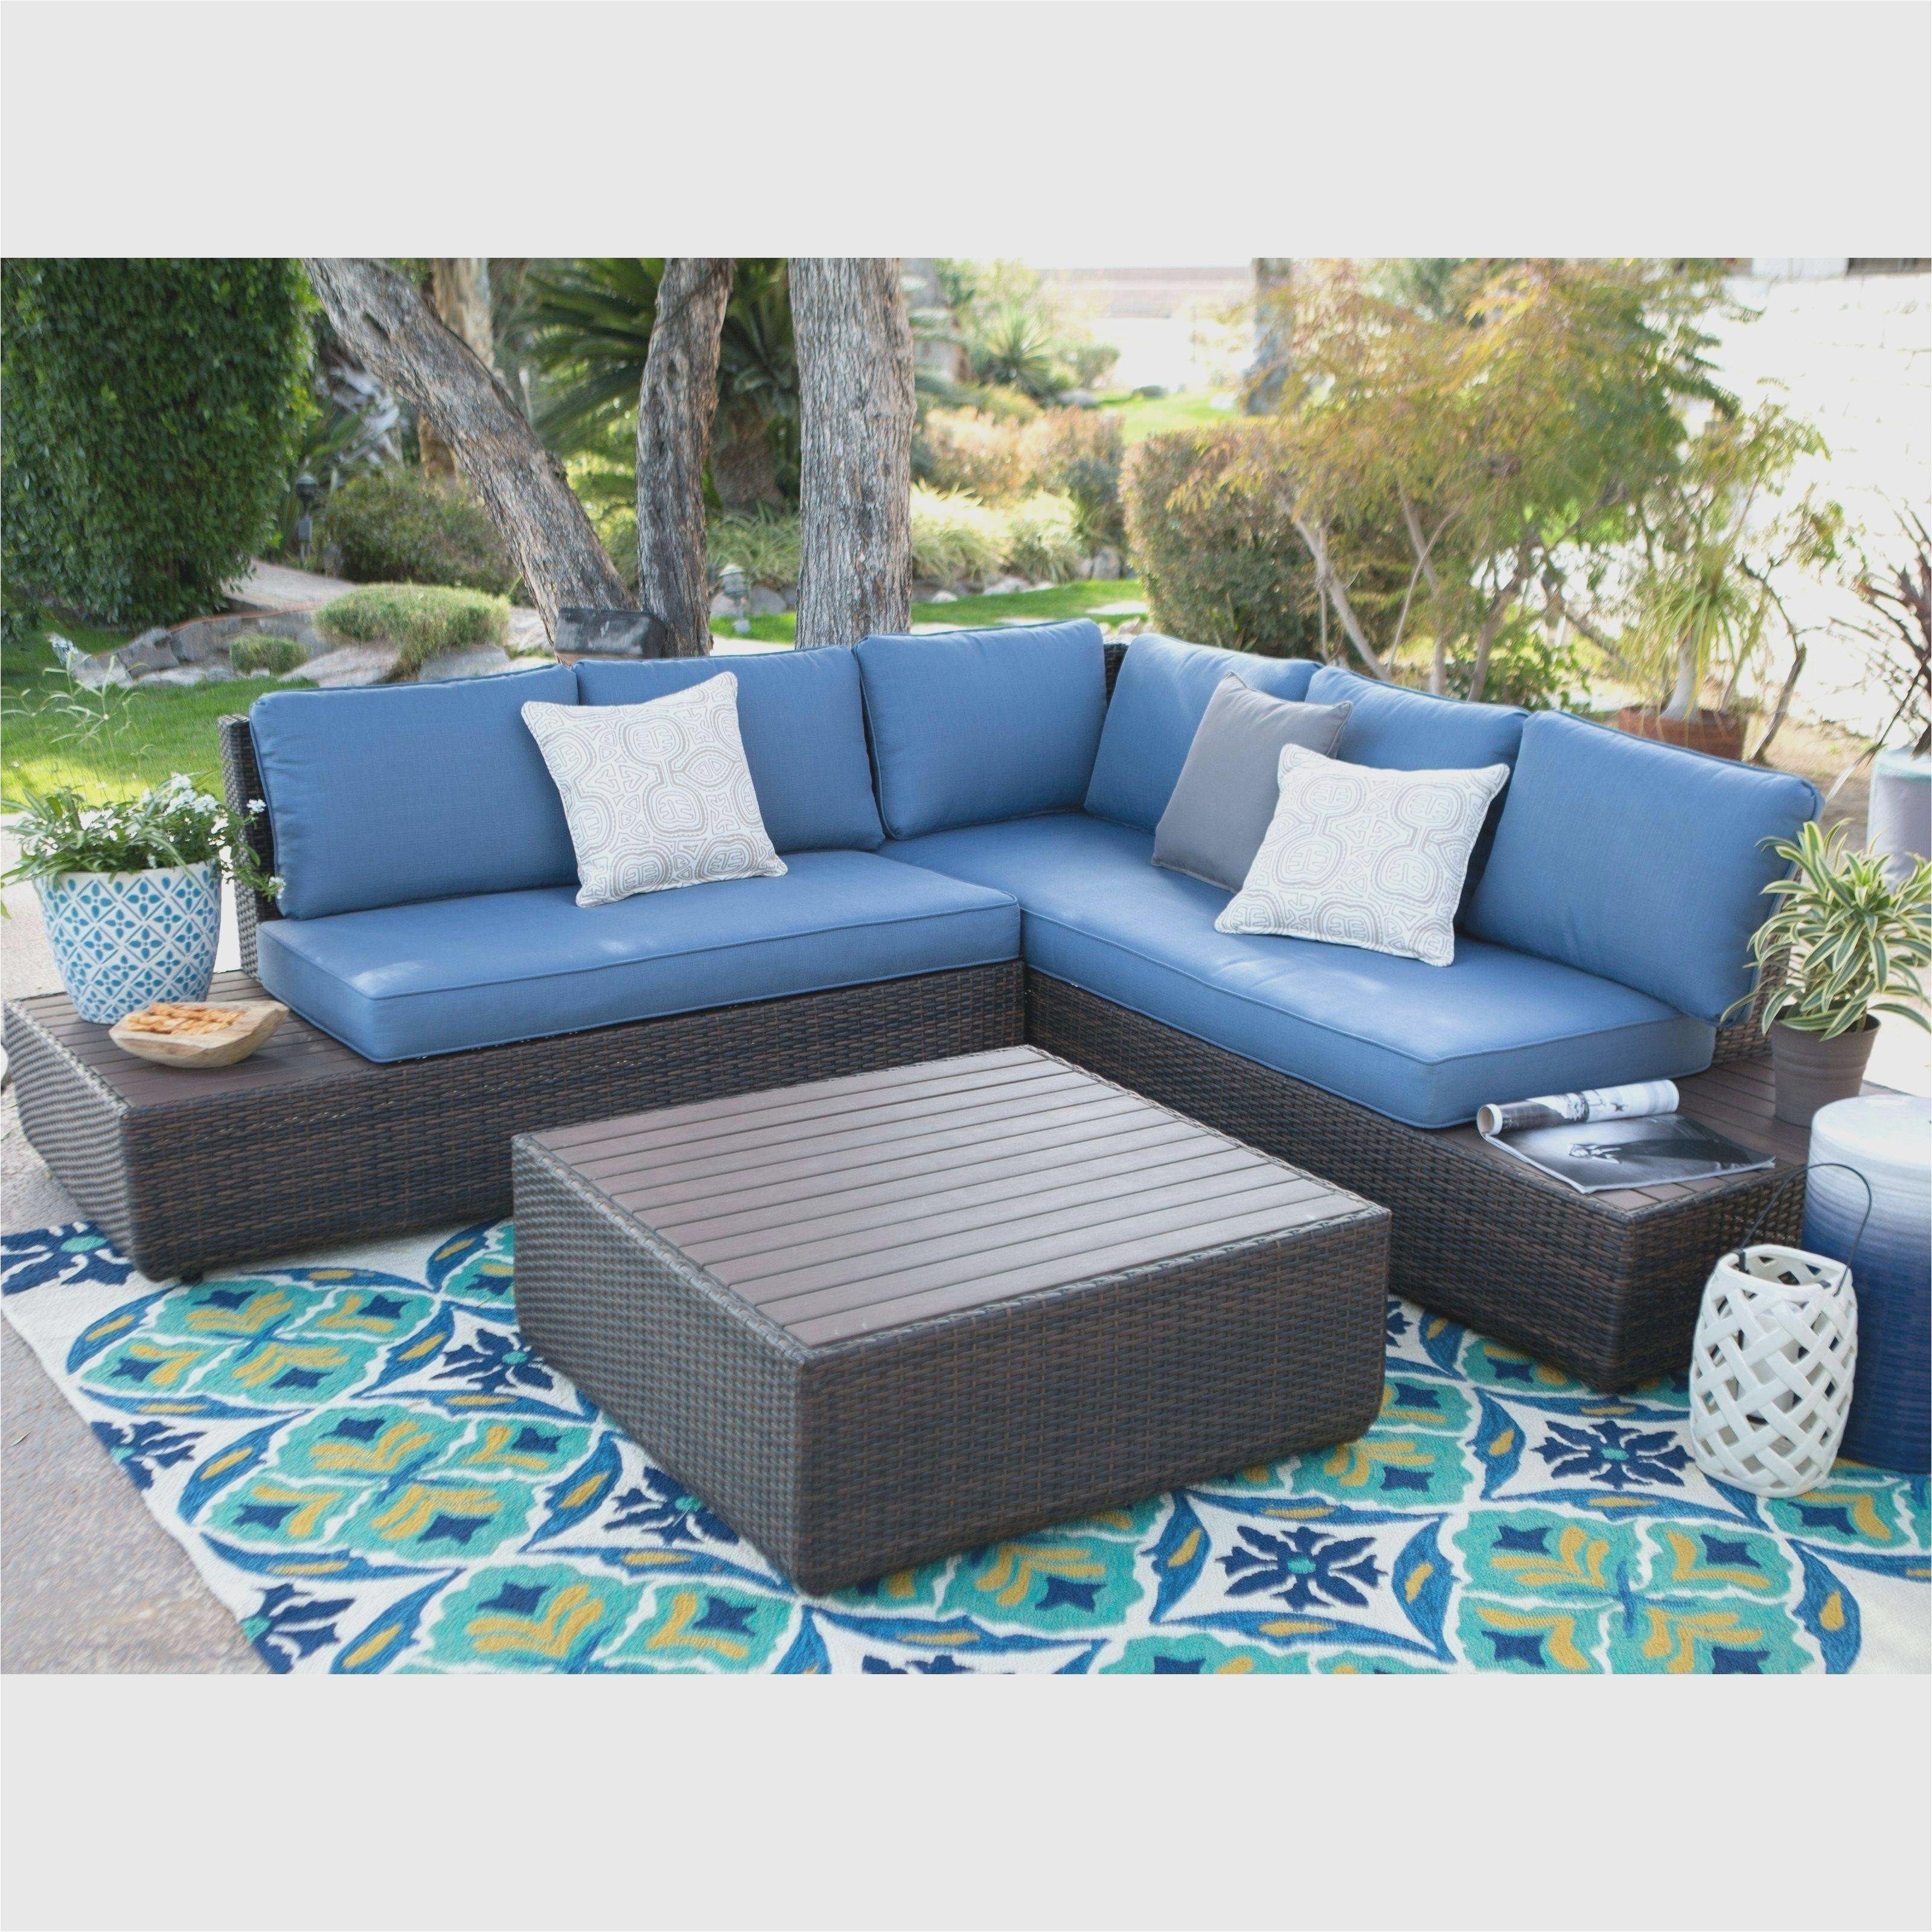 Discount Online Furniture Stores